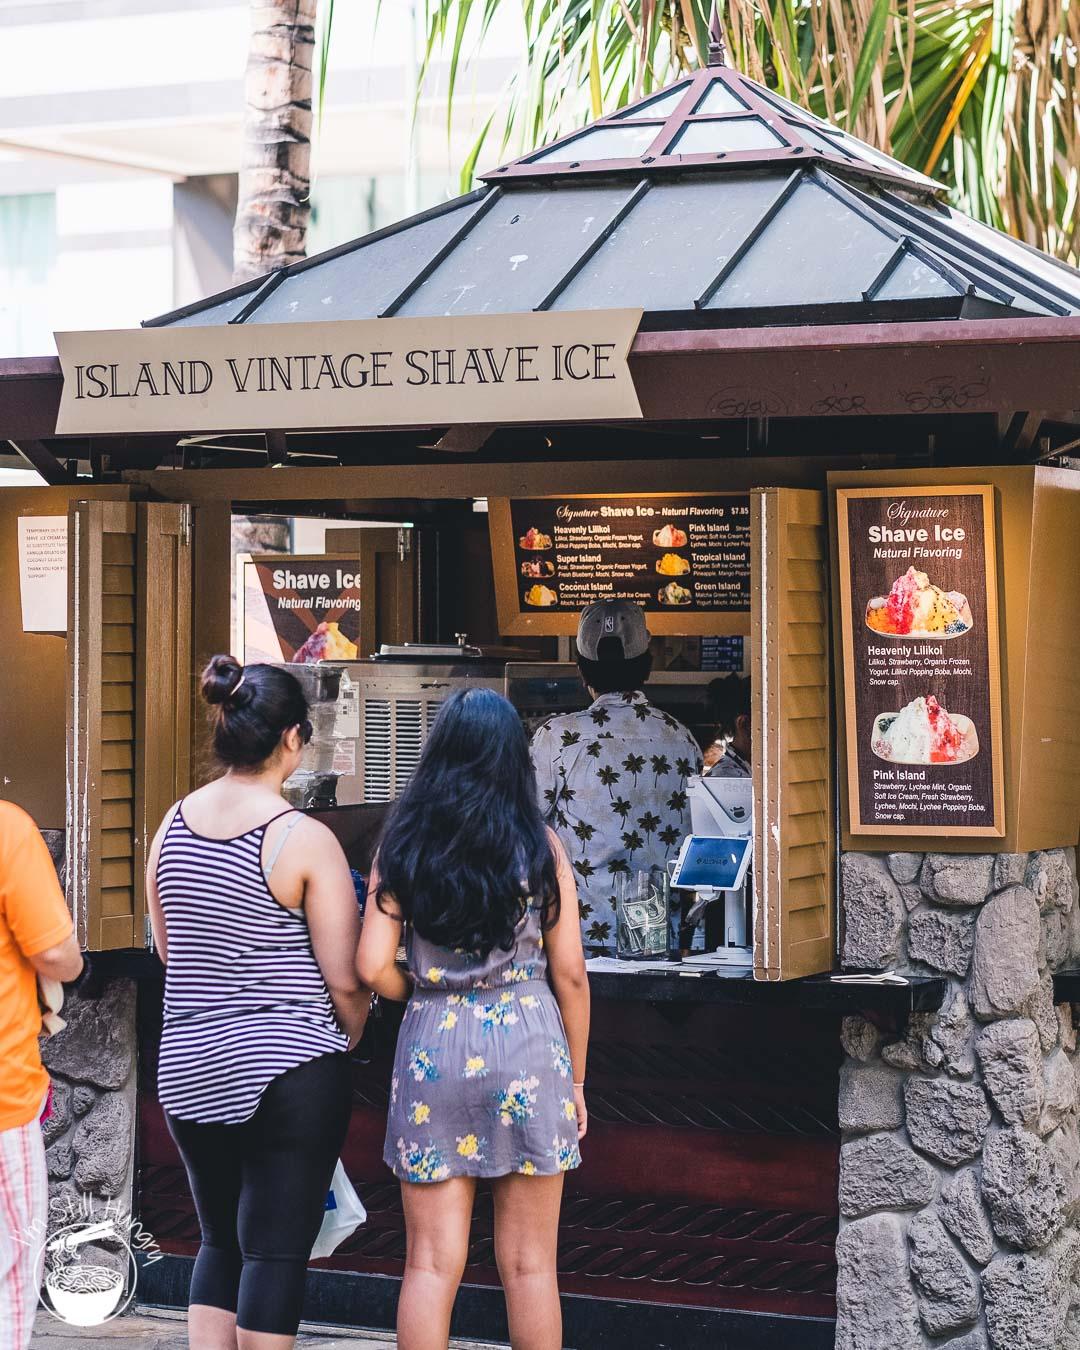 Island Vintage Shave Ice